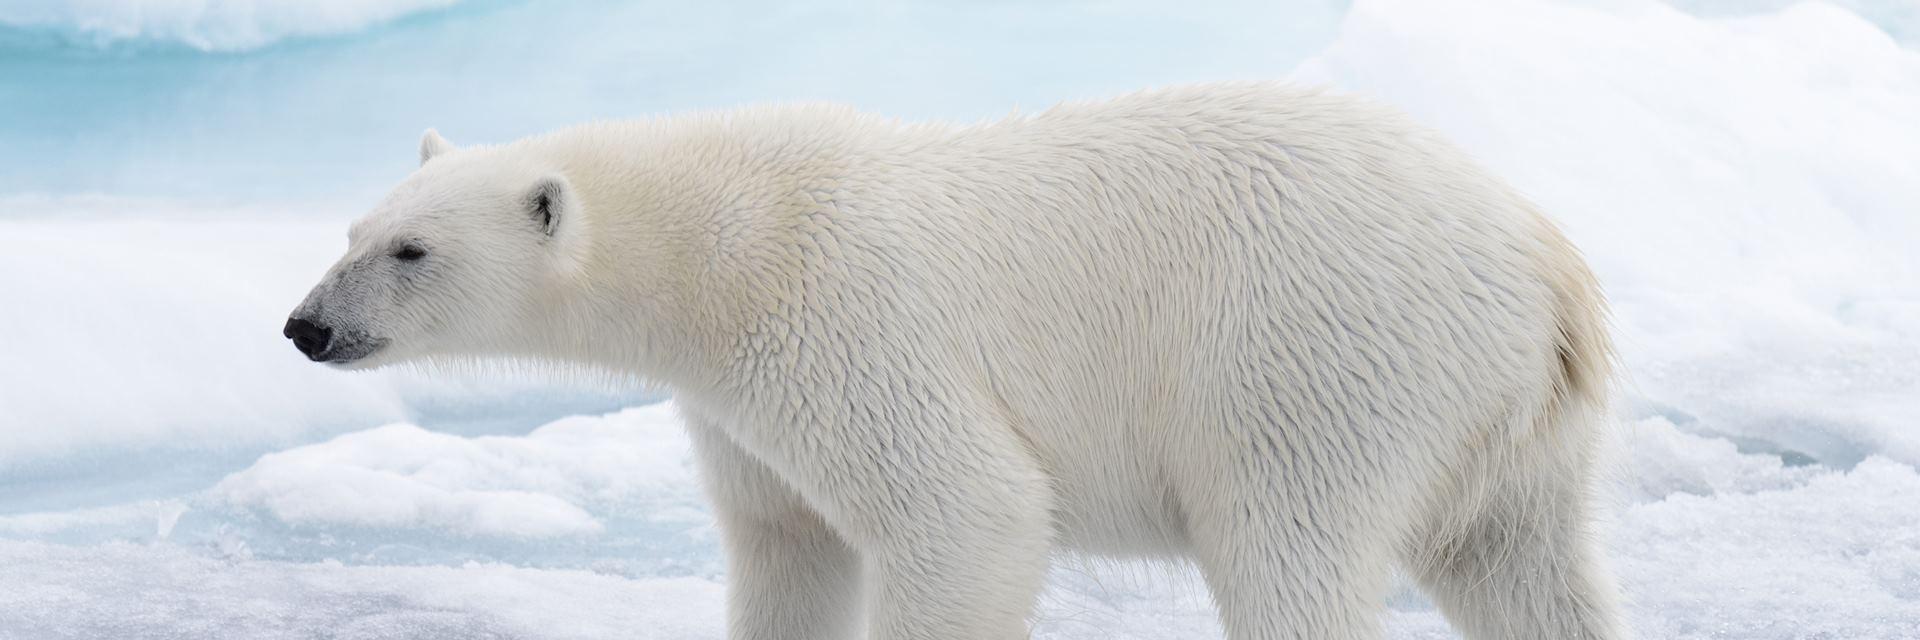 Polar bear in Barrow